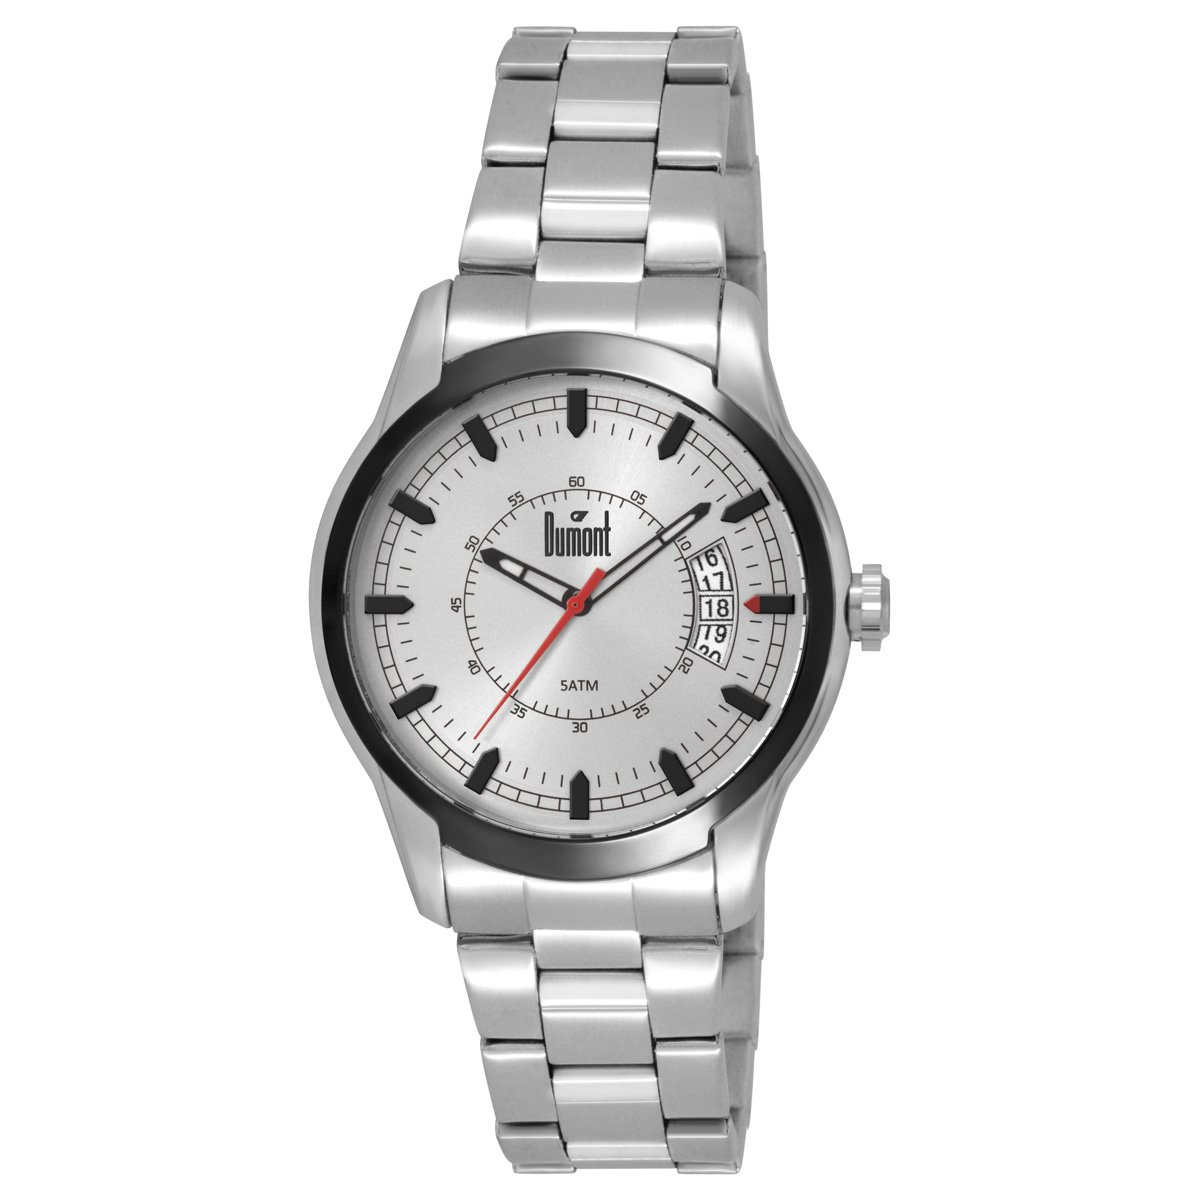 62fb206d86b Relógio Dumont Caixa e Pulseira De Metal - Compre Agora